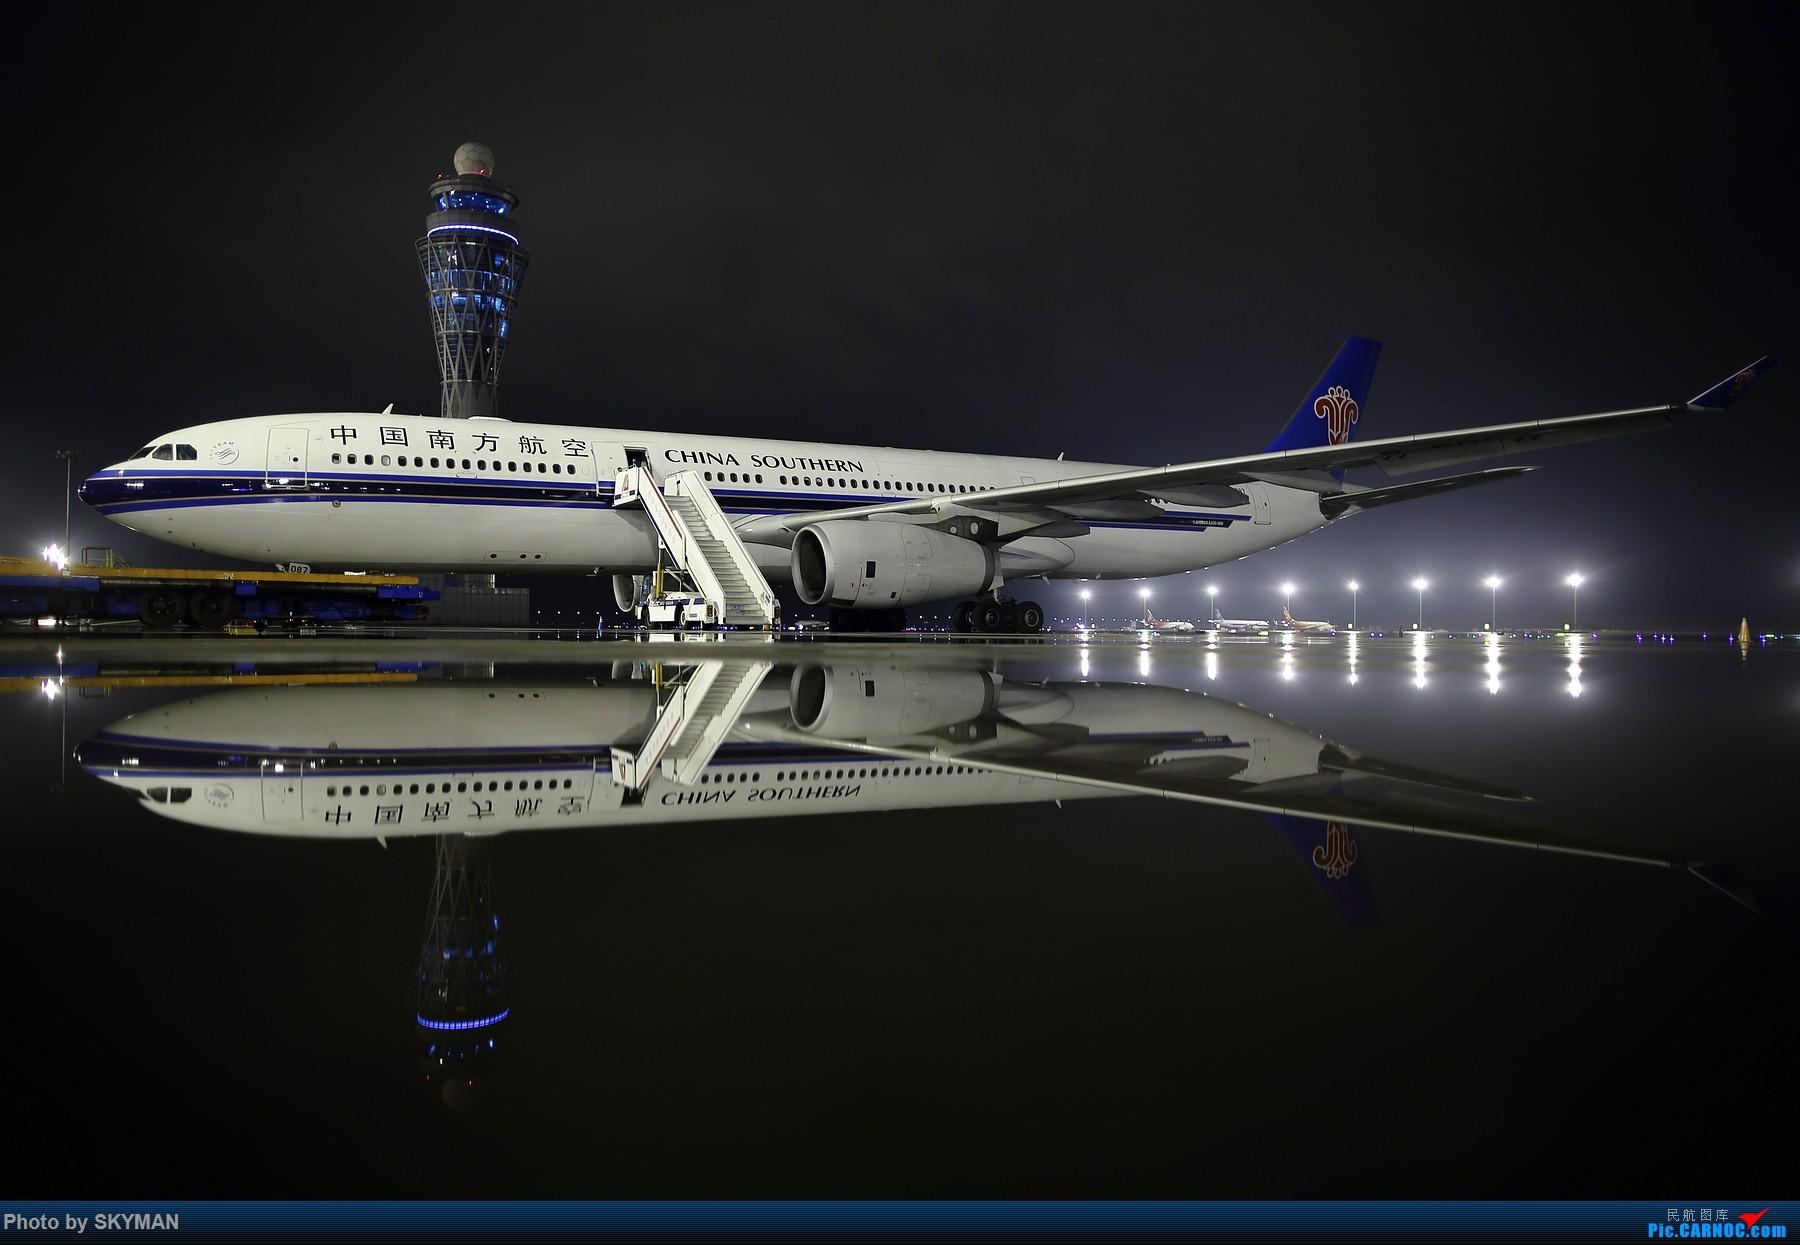 BLDDQ 镜 夜 湿。。。。。 AIRBUS A330-300 B-6087 中国深圳宝安国际机场